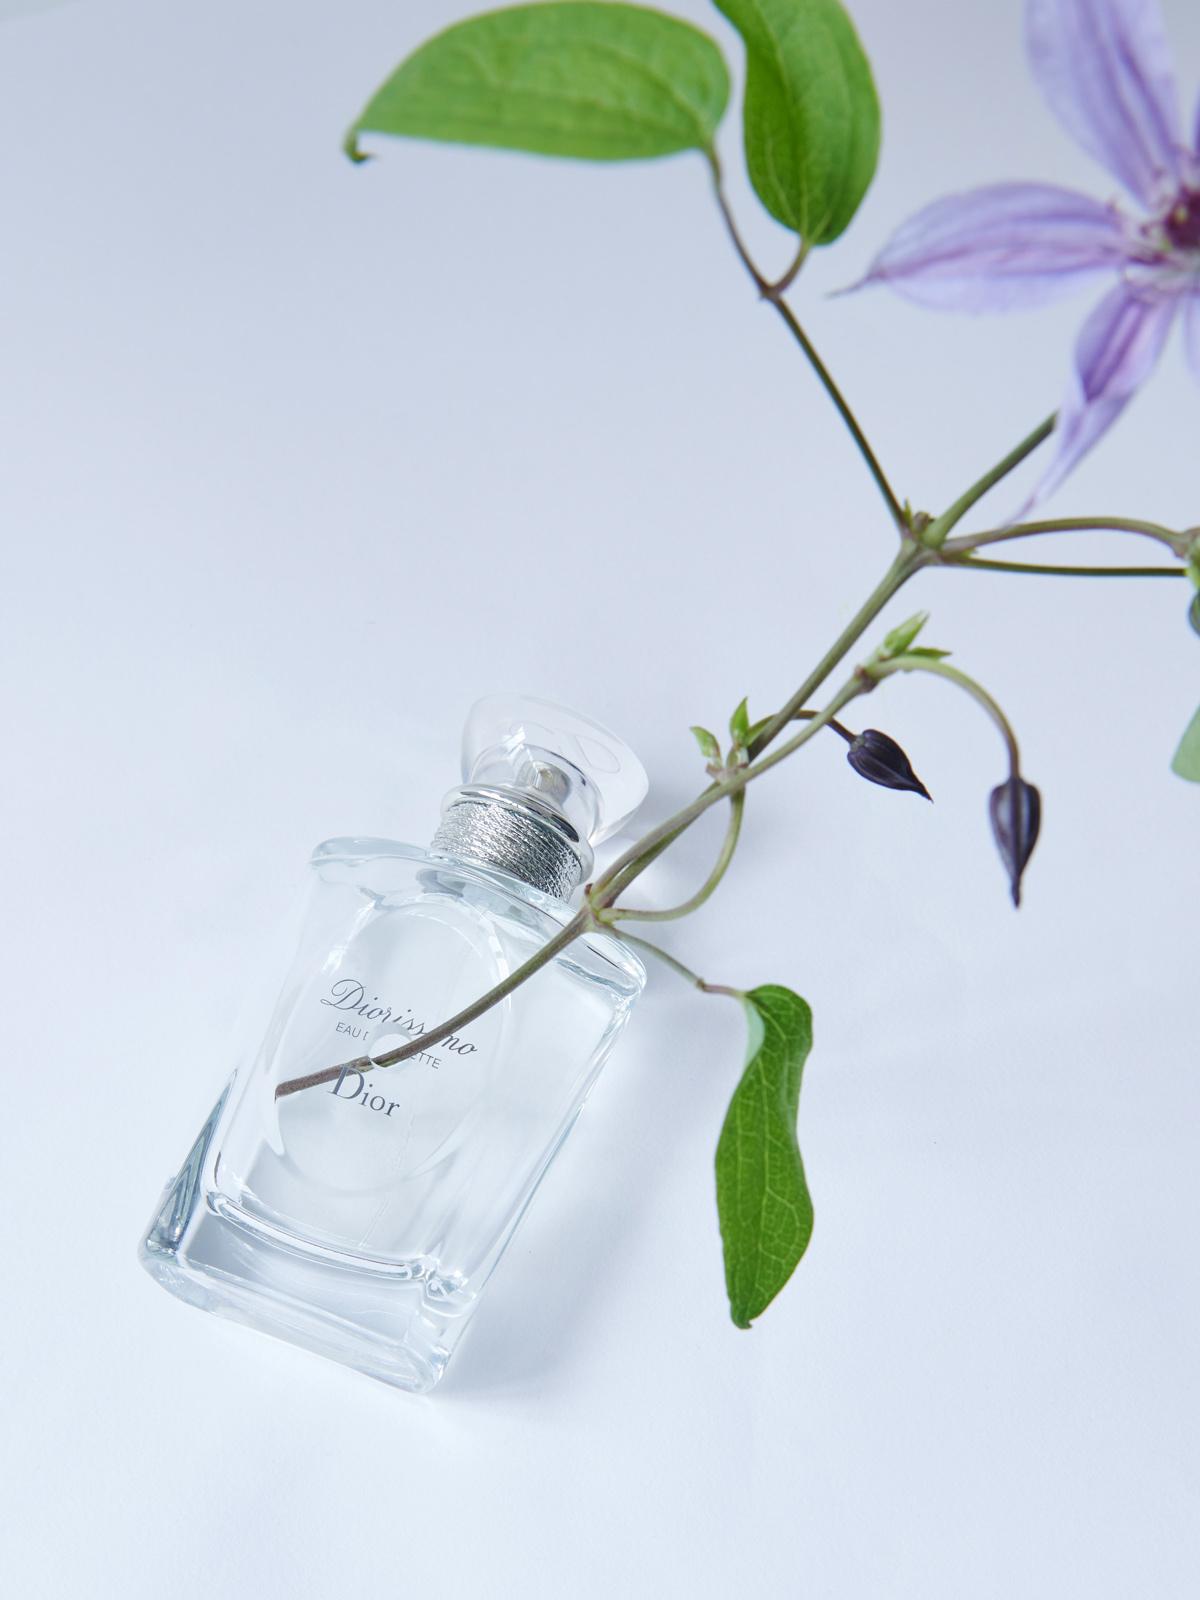 timeless perfume classics diorissimo by Dior